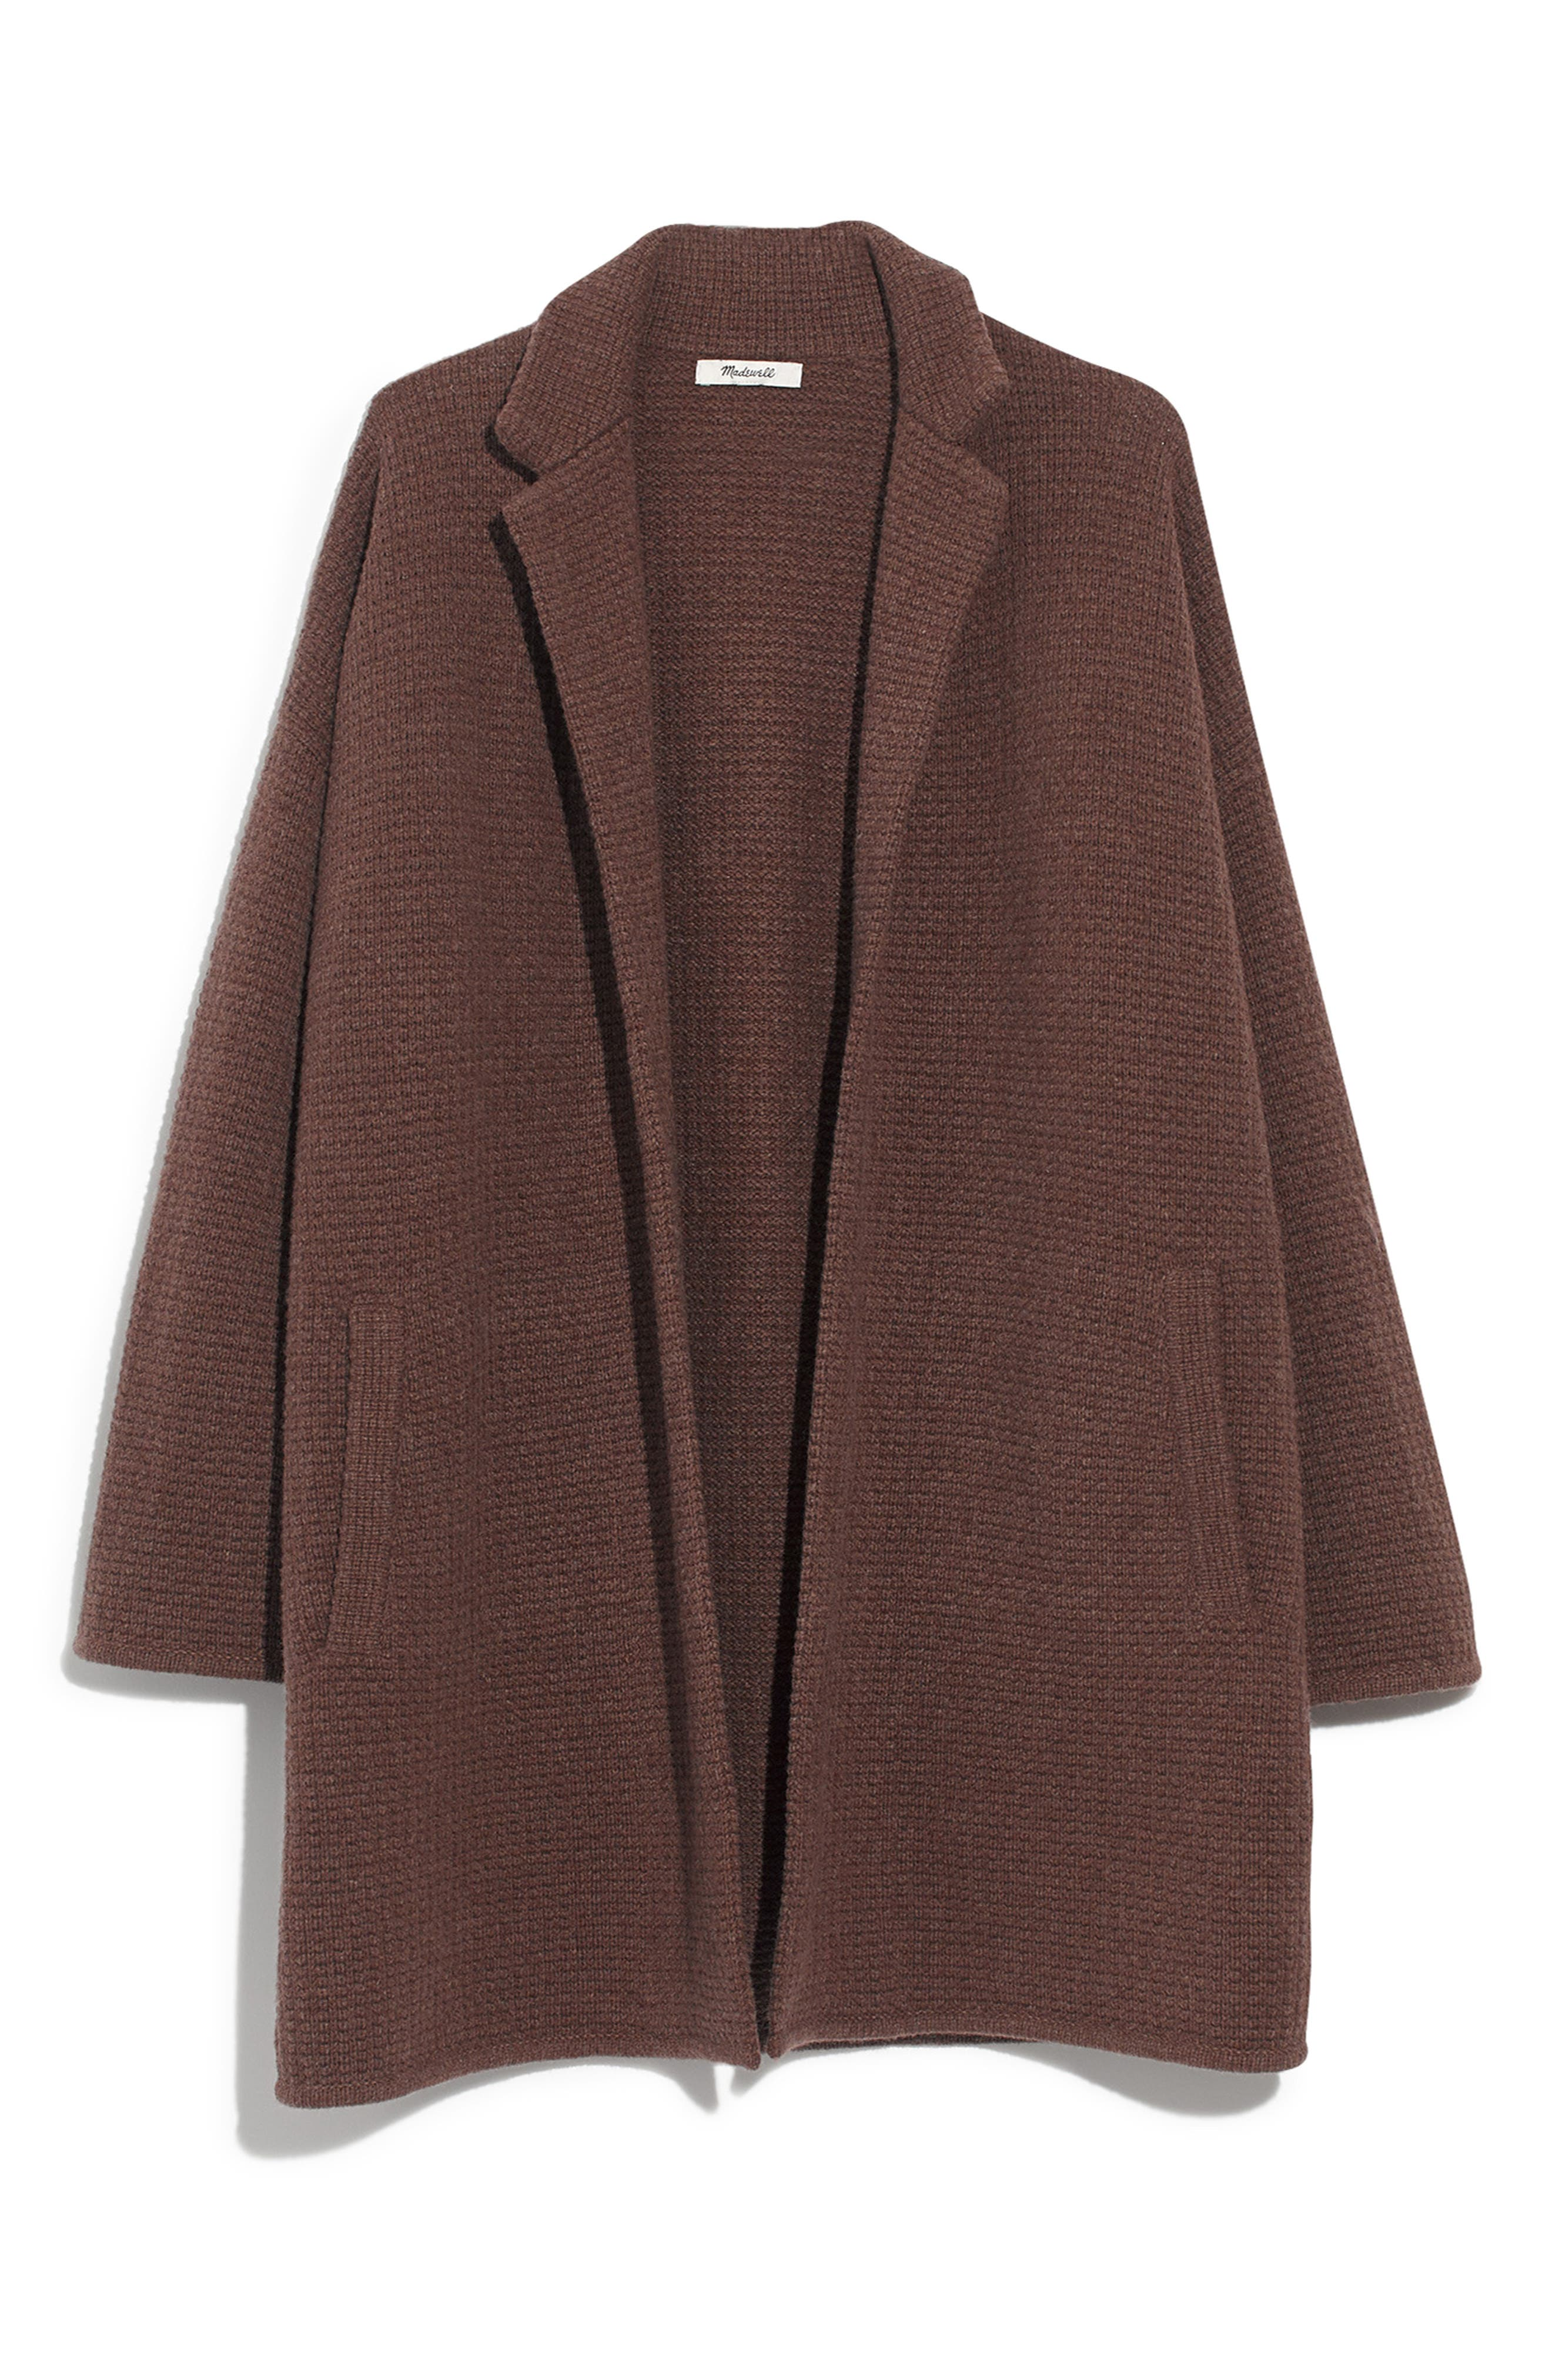 Chilton Sweater Coat,                             Alternate thumbnail 4, color,                             HEATHER COCOA